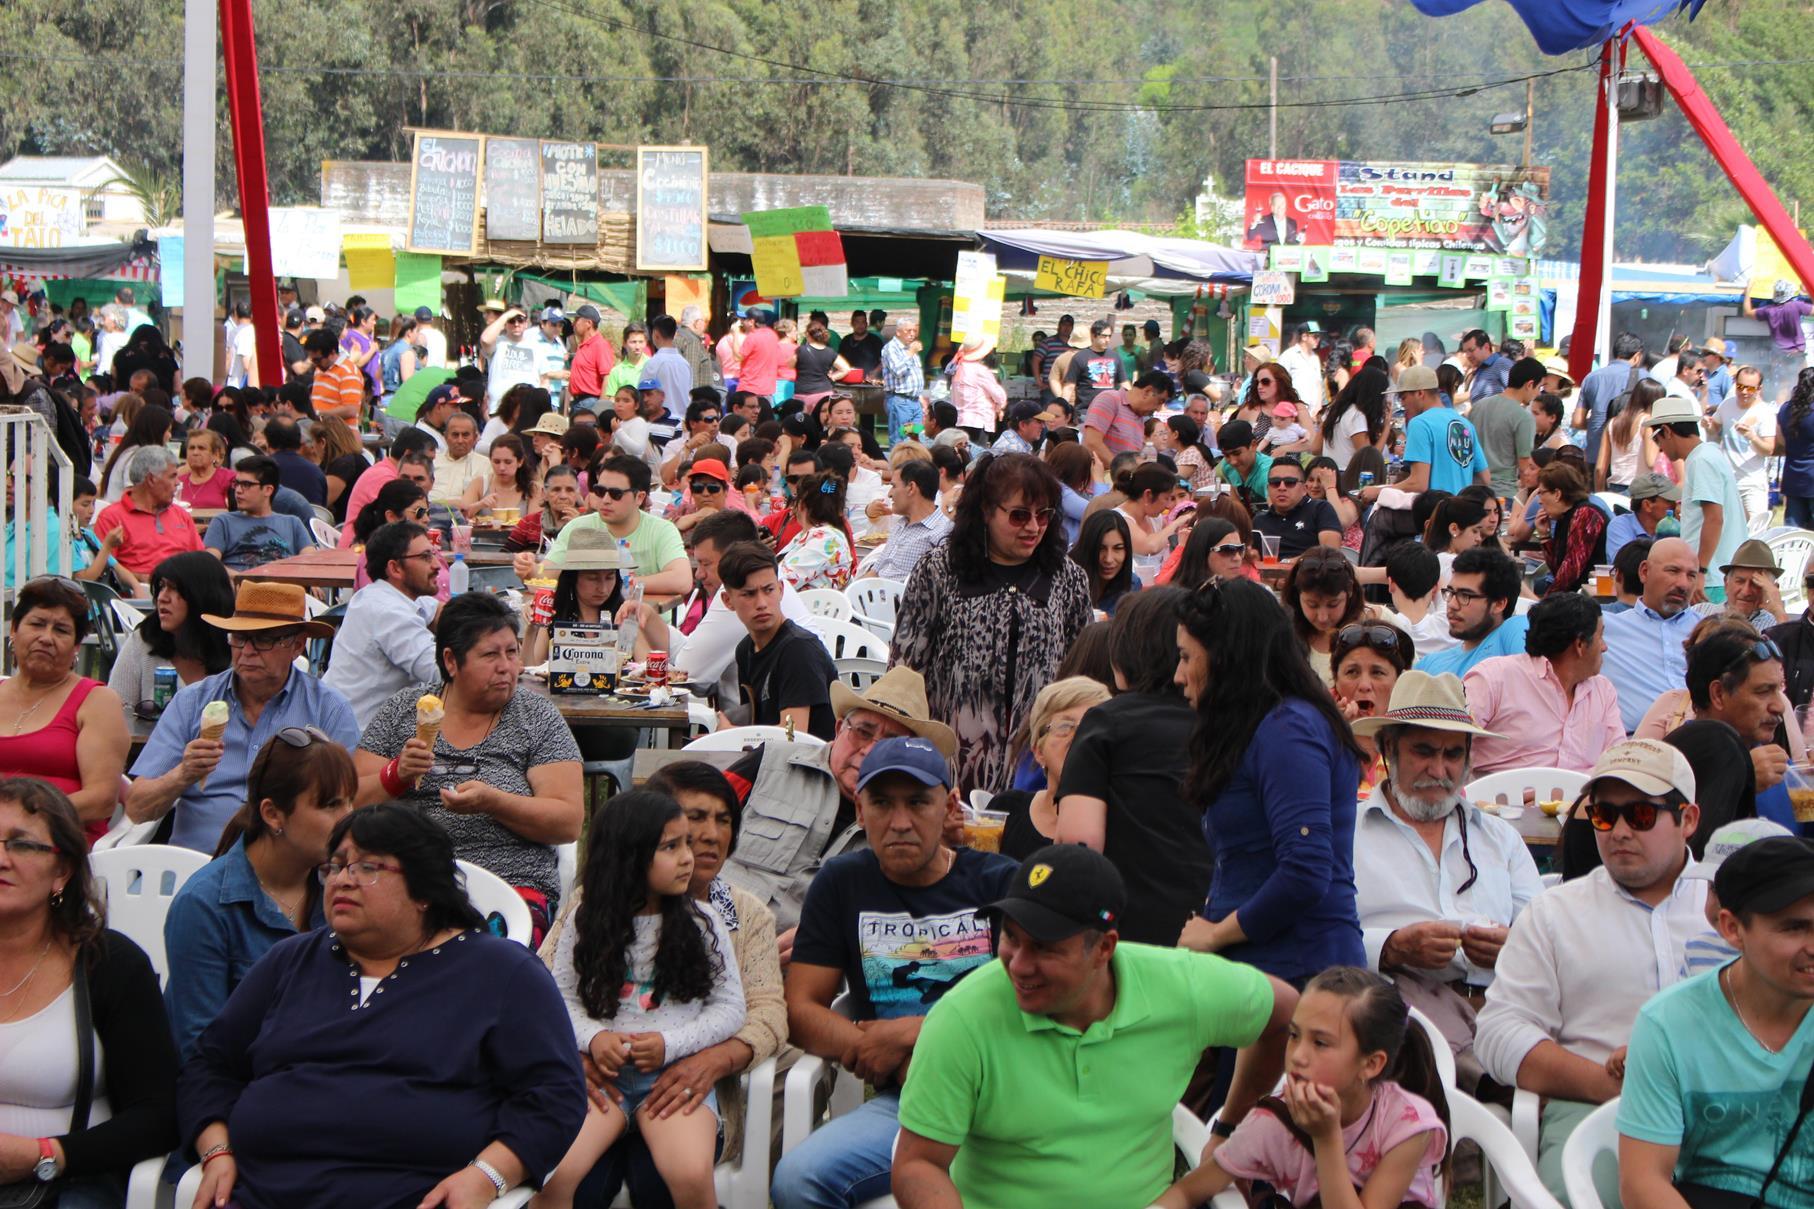 Fiesta Ruedas de Larmahue 2017 en Pichidegua